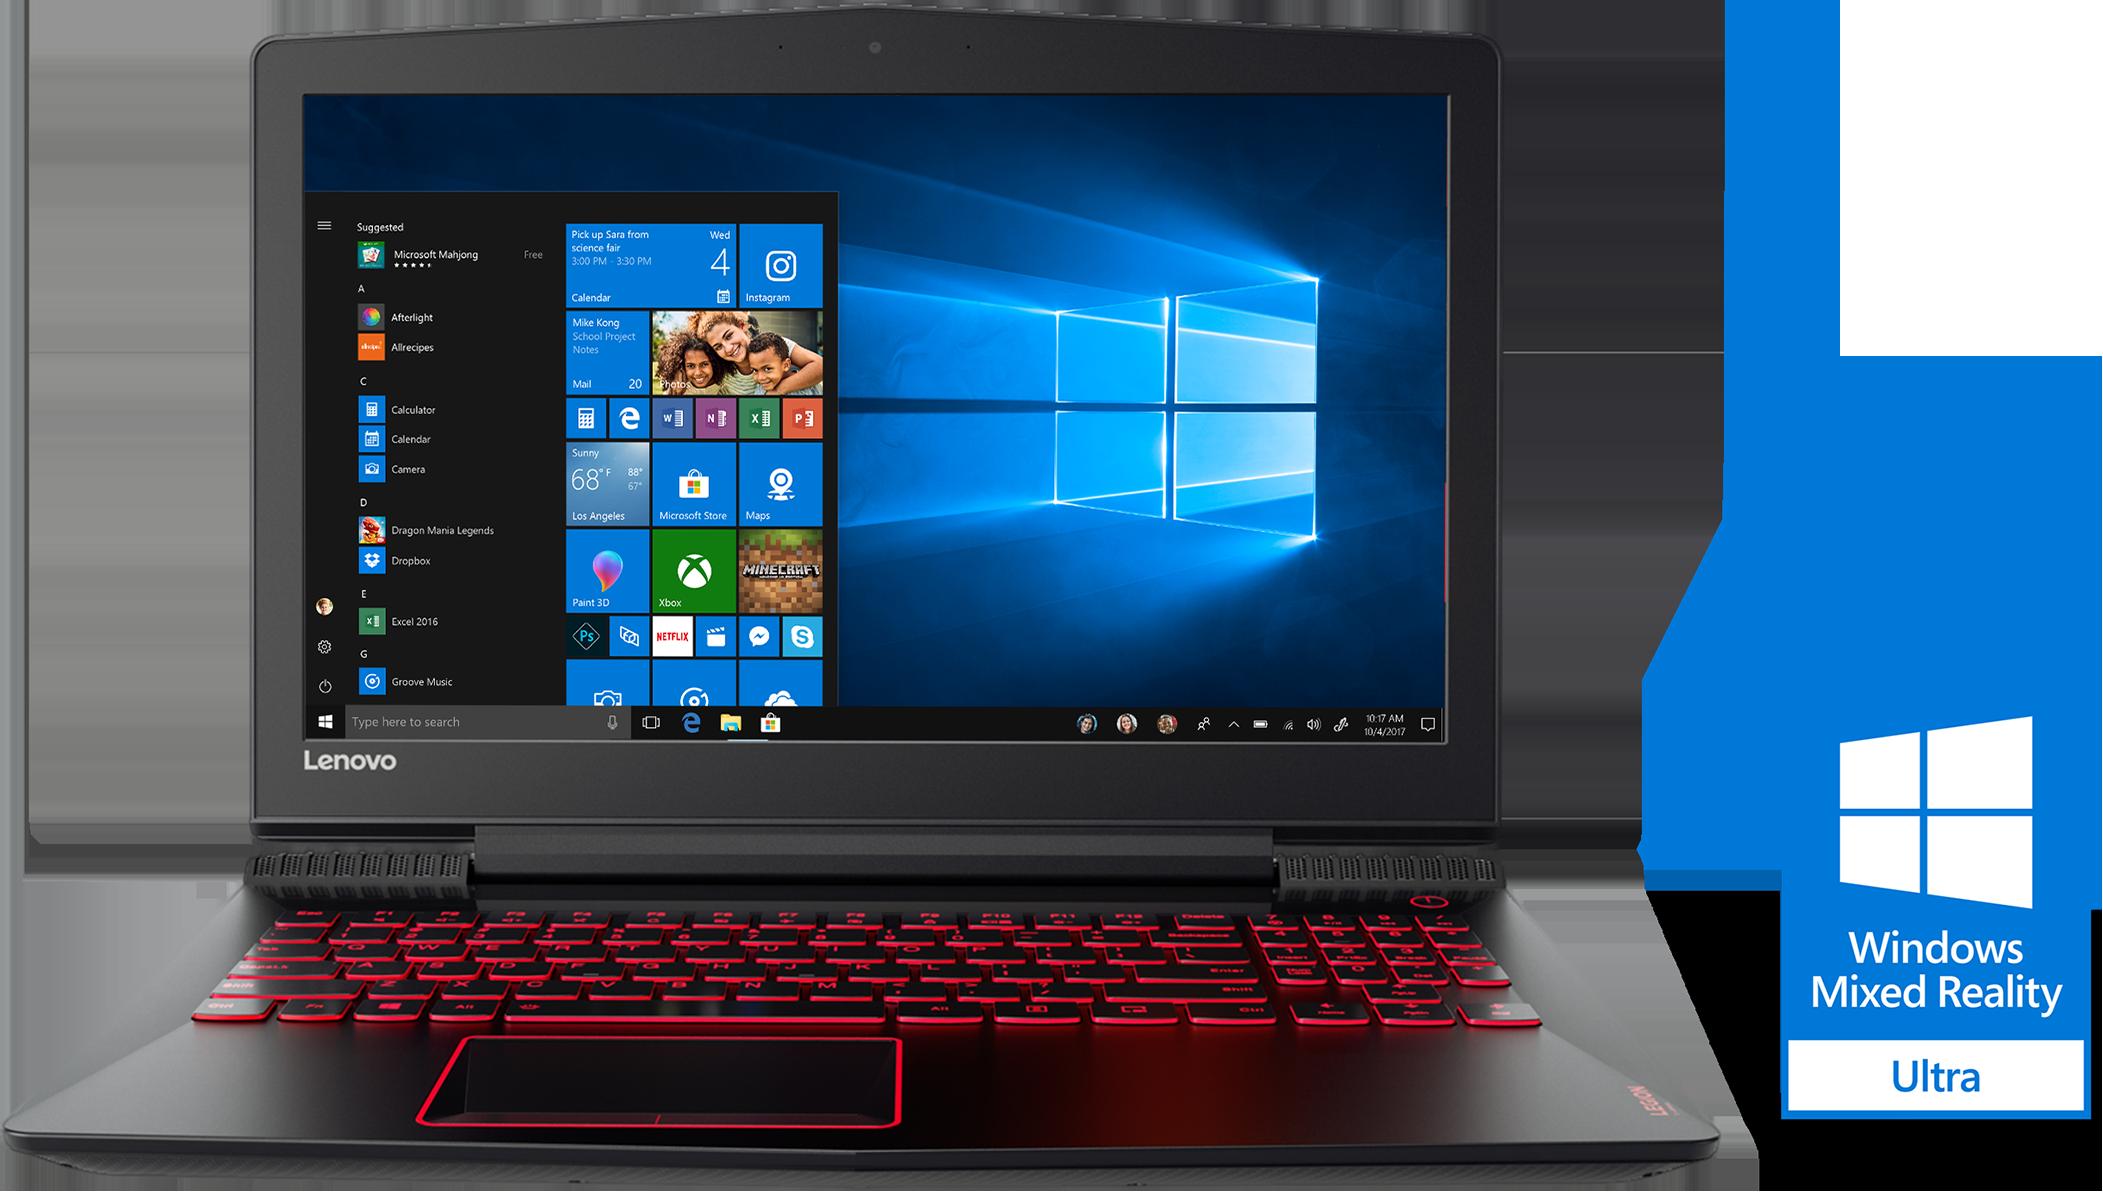 Lenovo Legion Y520 80WK00CCUS Gaming Laptop